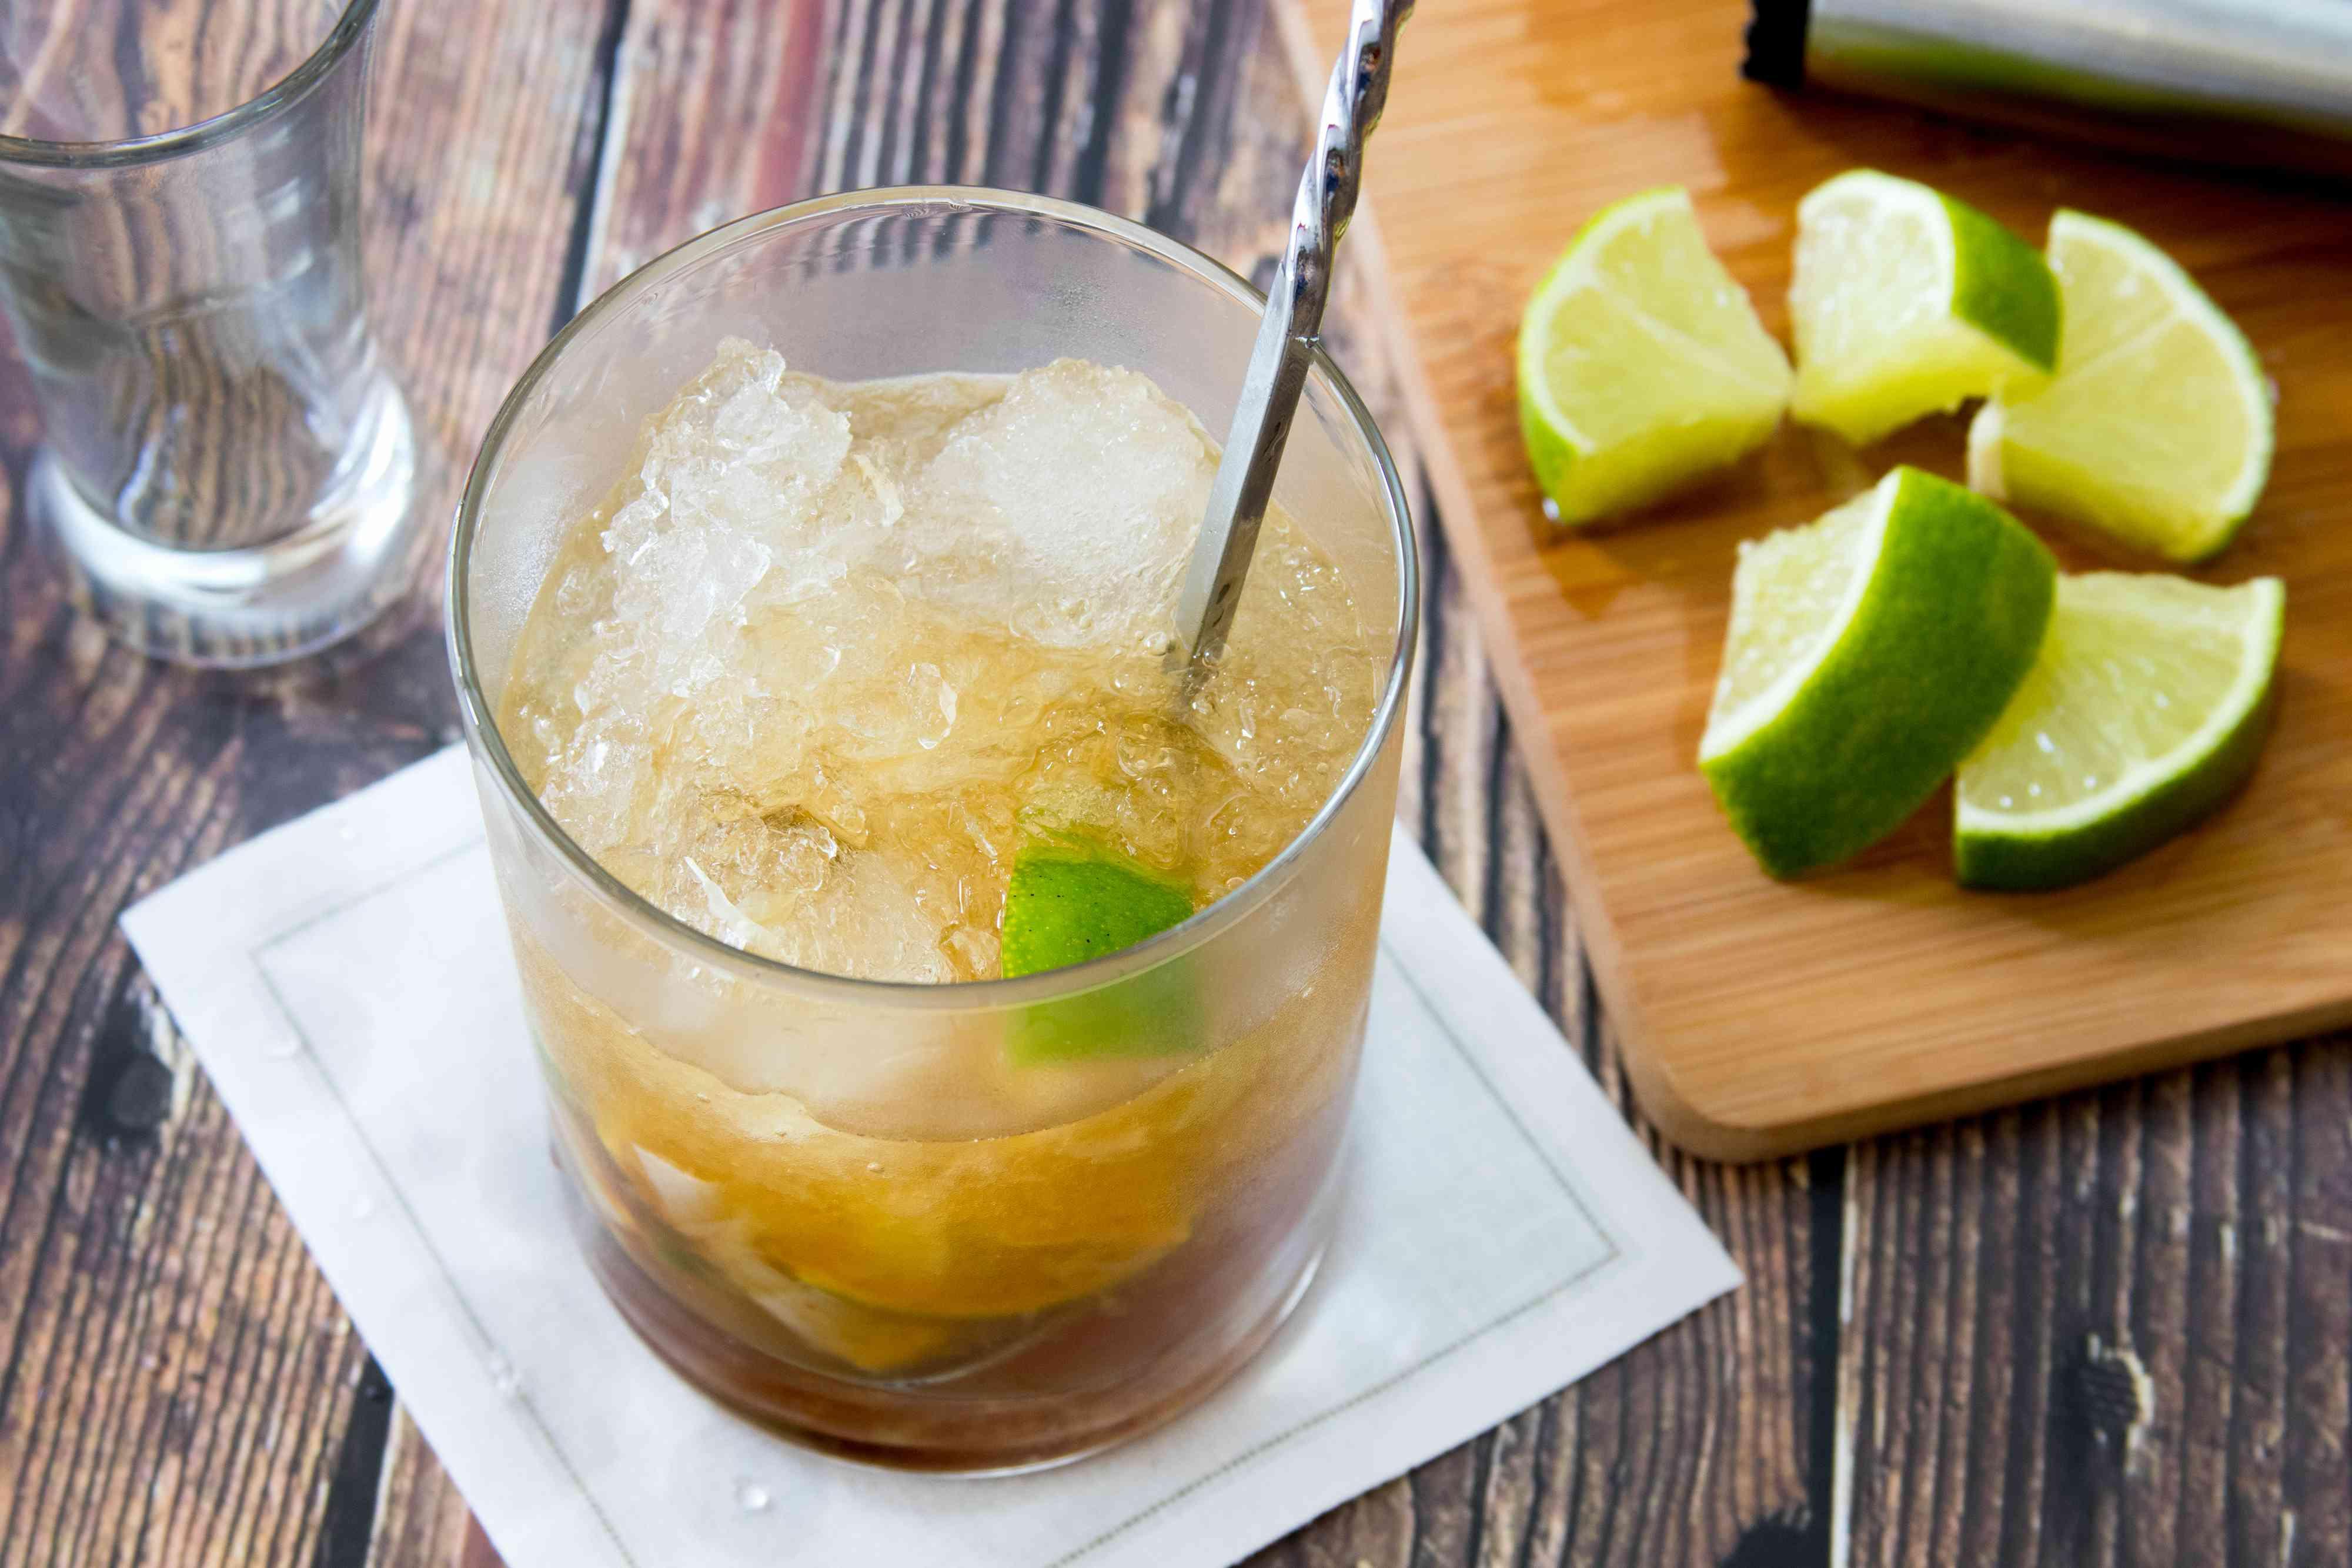 Stirring a Caipiroska Cocktail